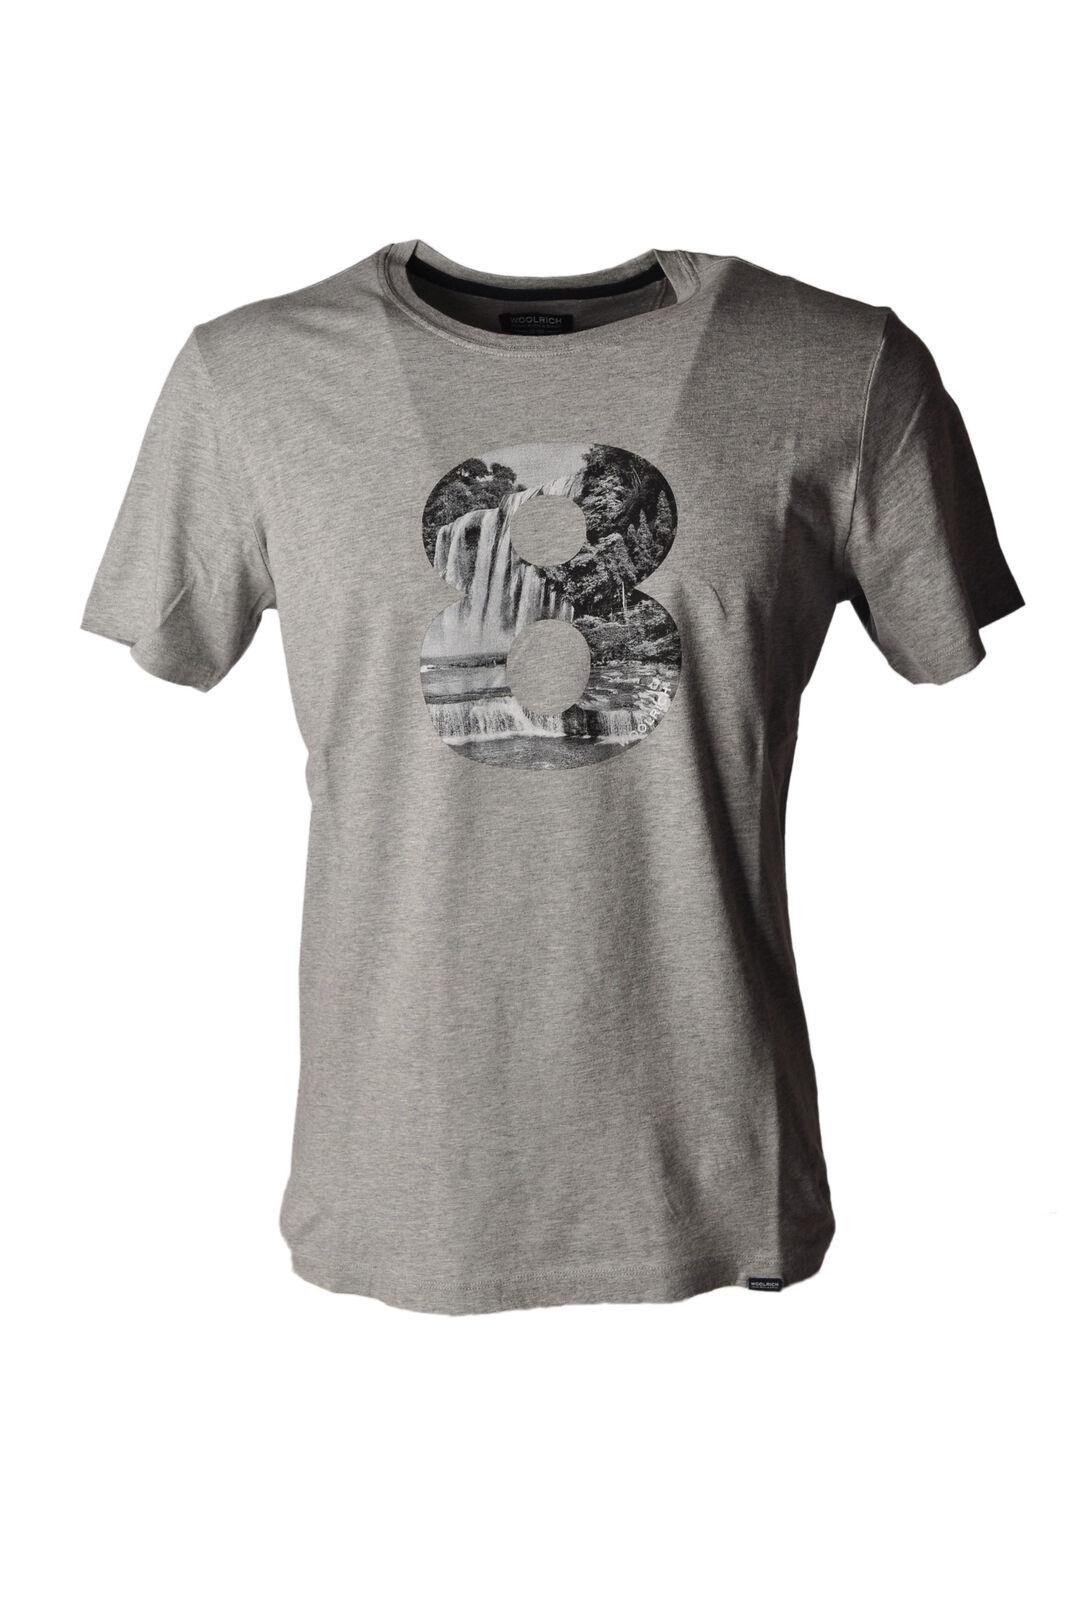 Woolrich - Topwear-T-shirts - Man - Grau - 4892310H184352